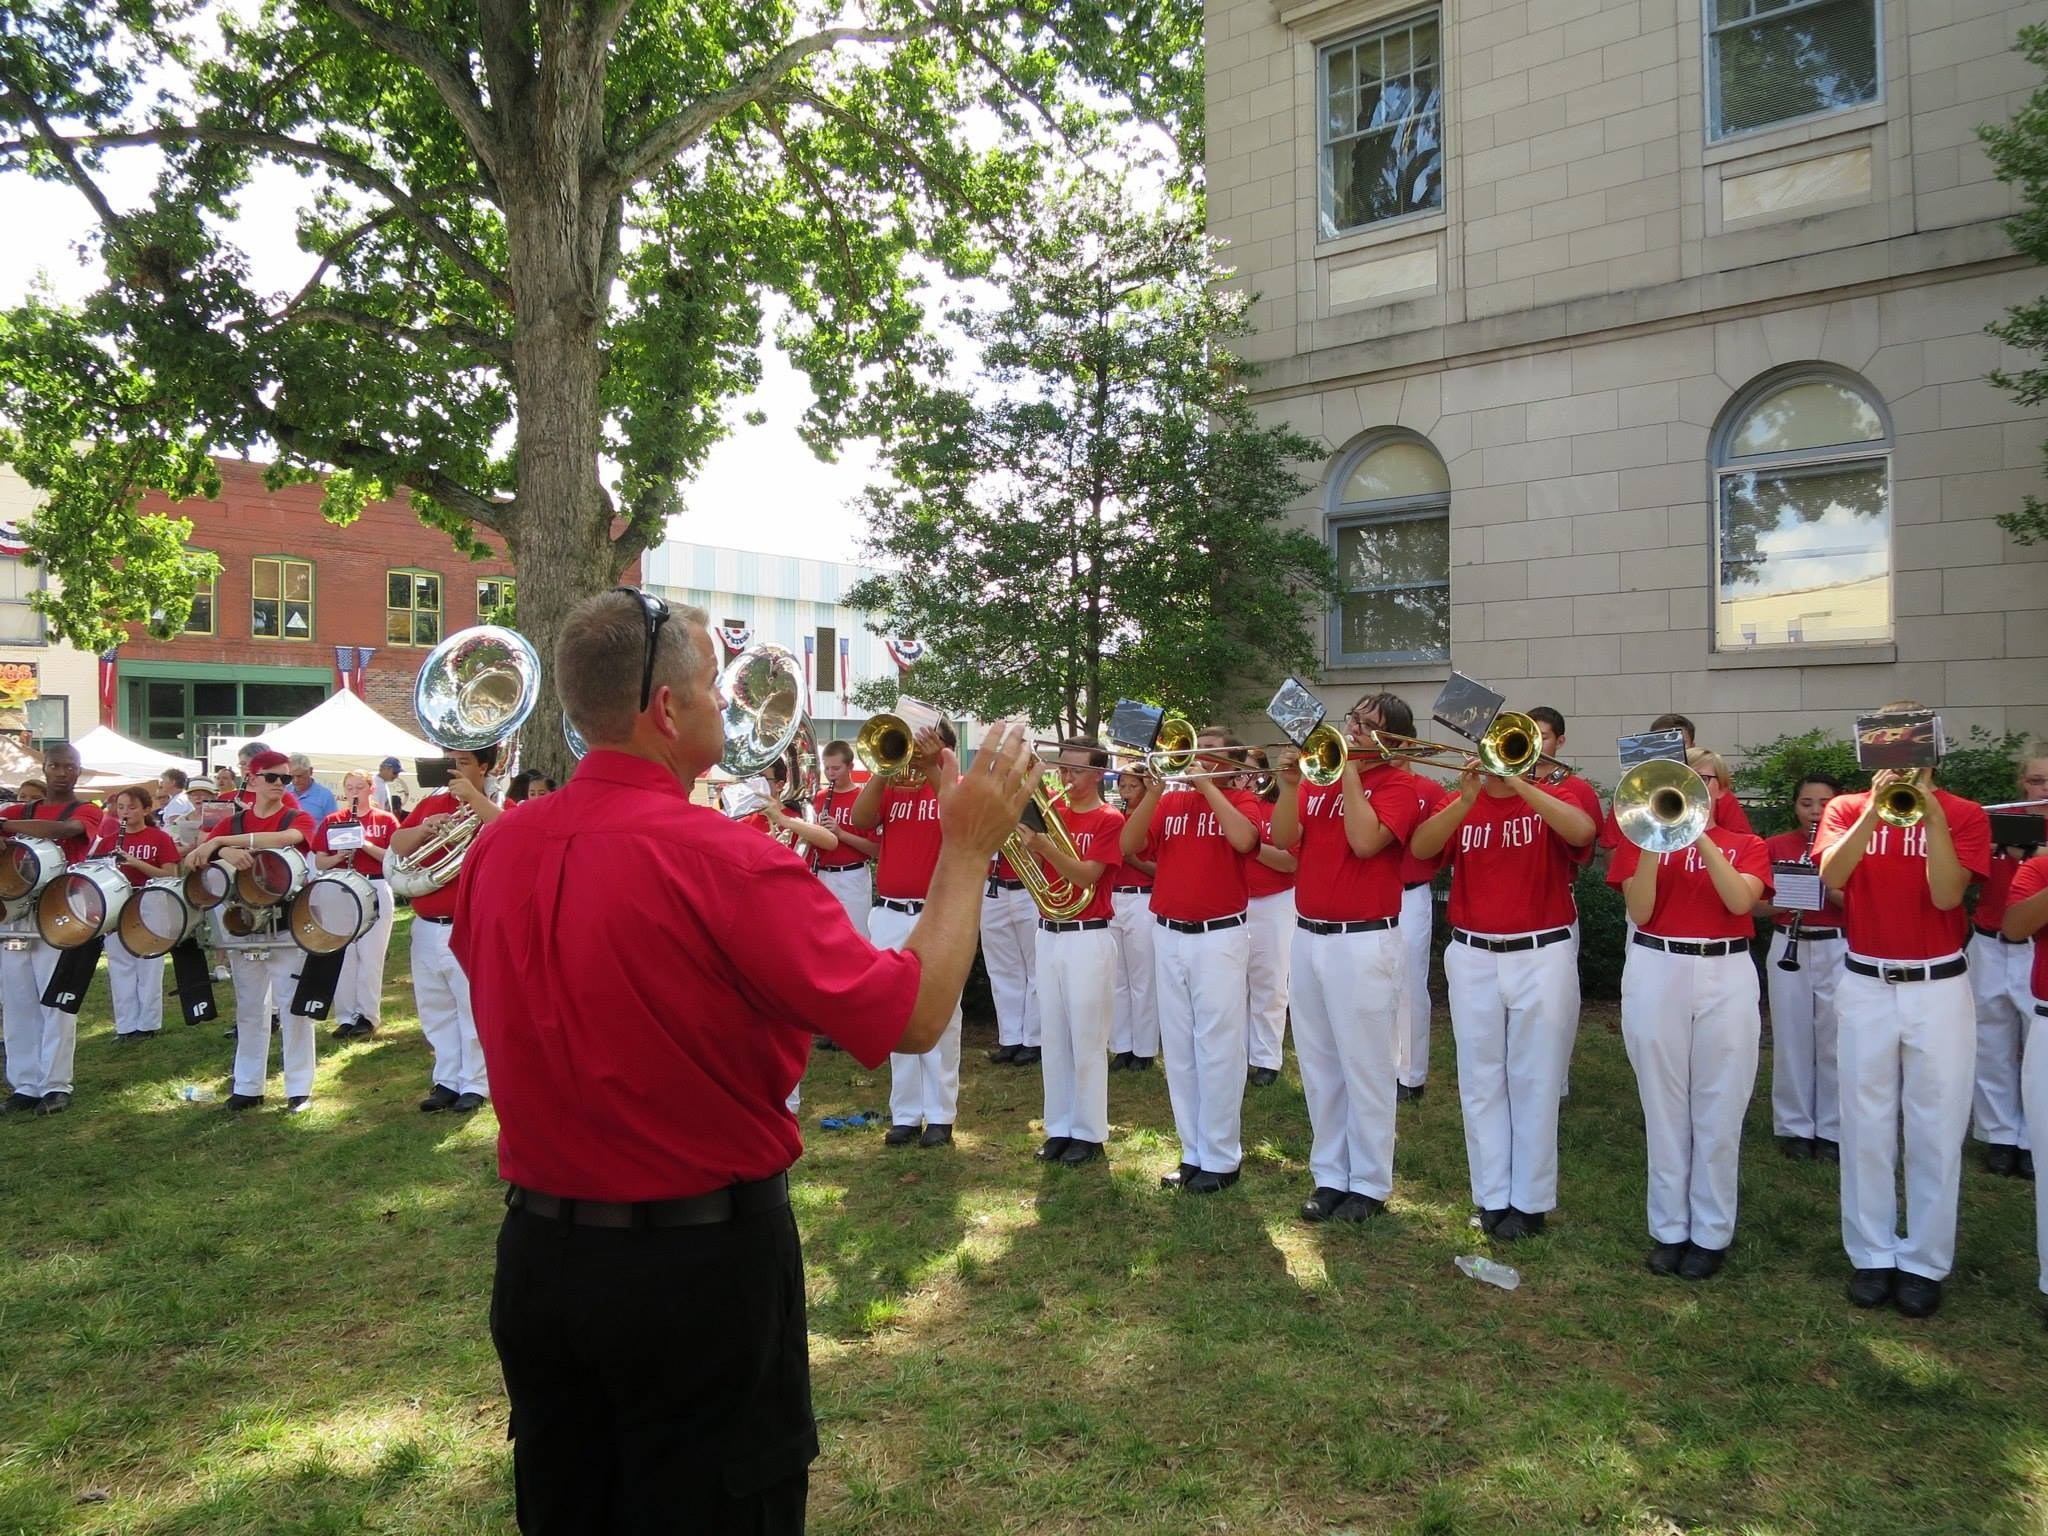 Band performing a song at Newton Square